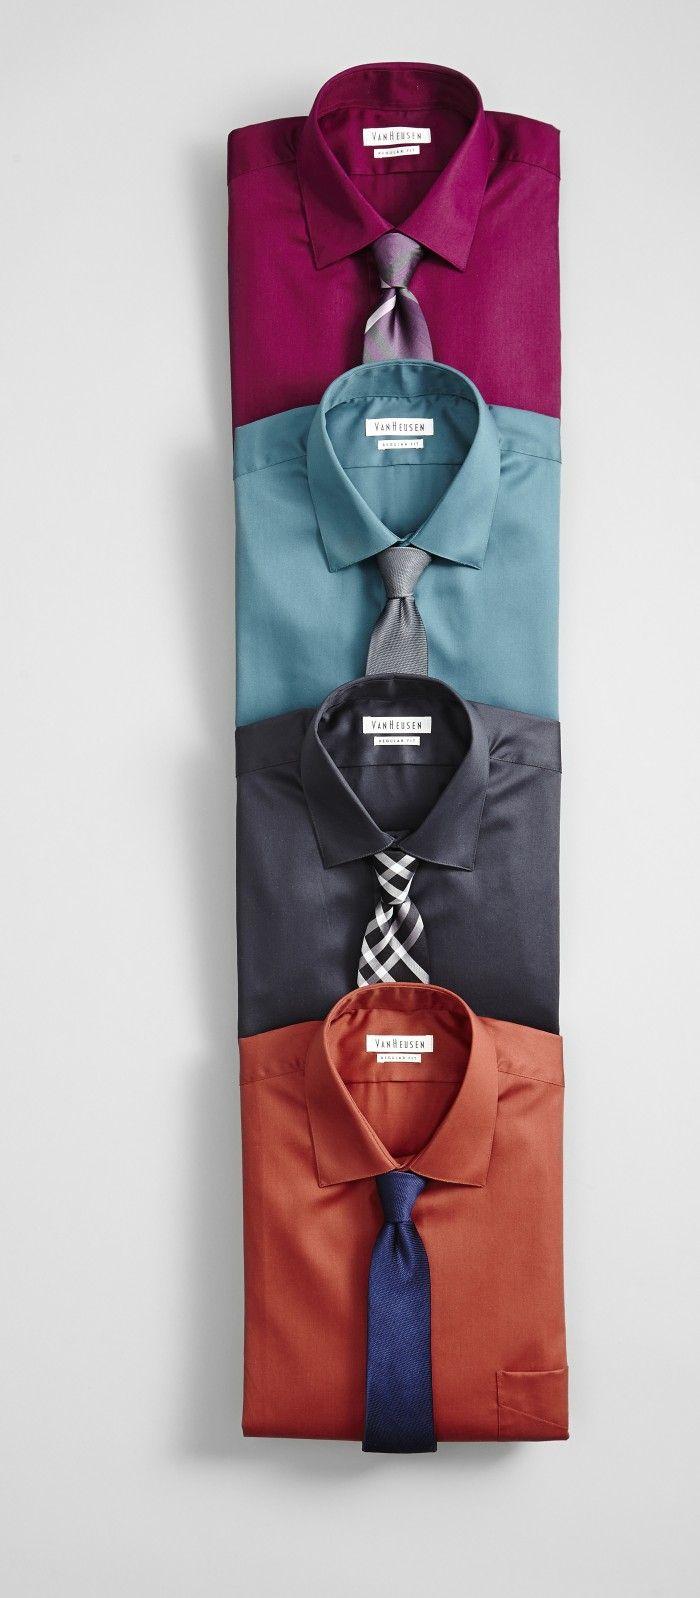 Men S Dress Shirts Men S Ties Jcpenney Mens Shirt Dress Dress Shirt And Tie Mens Shirts